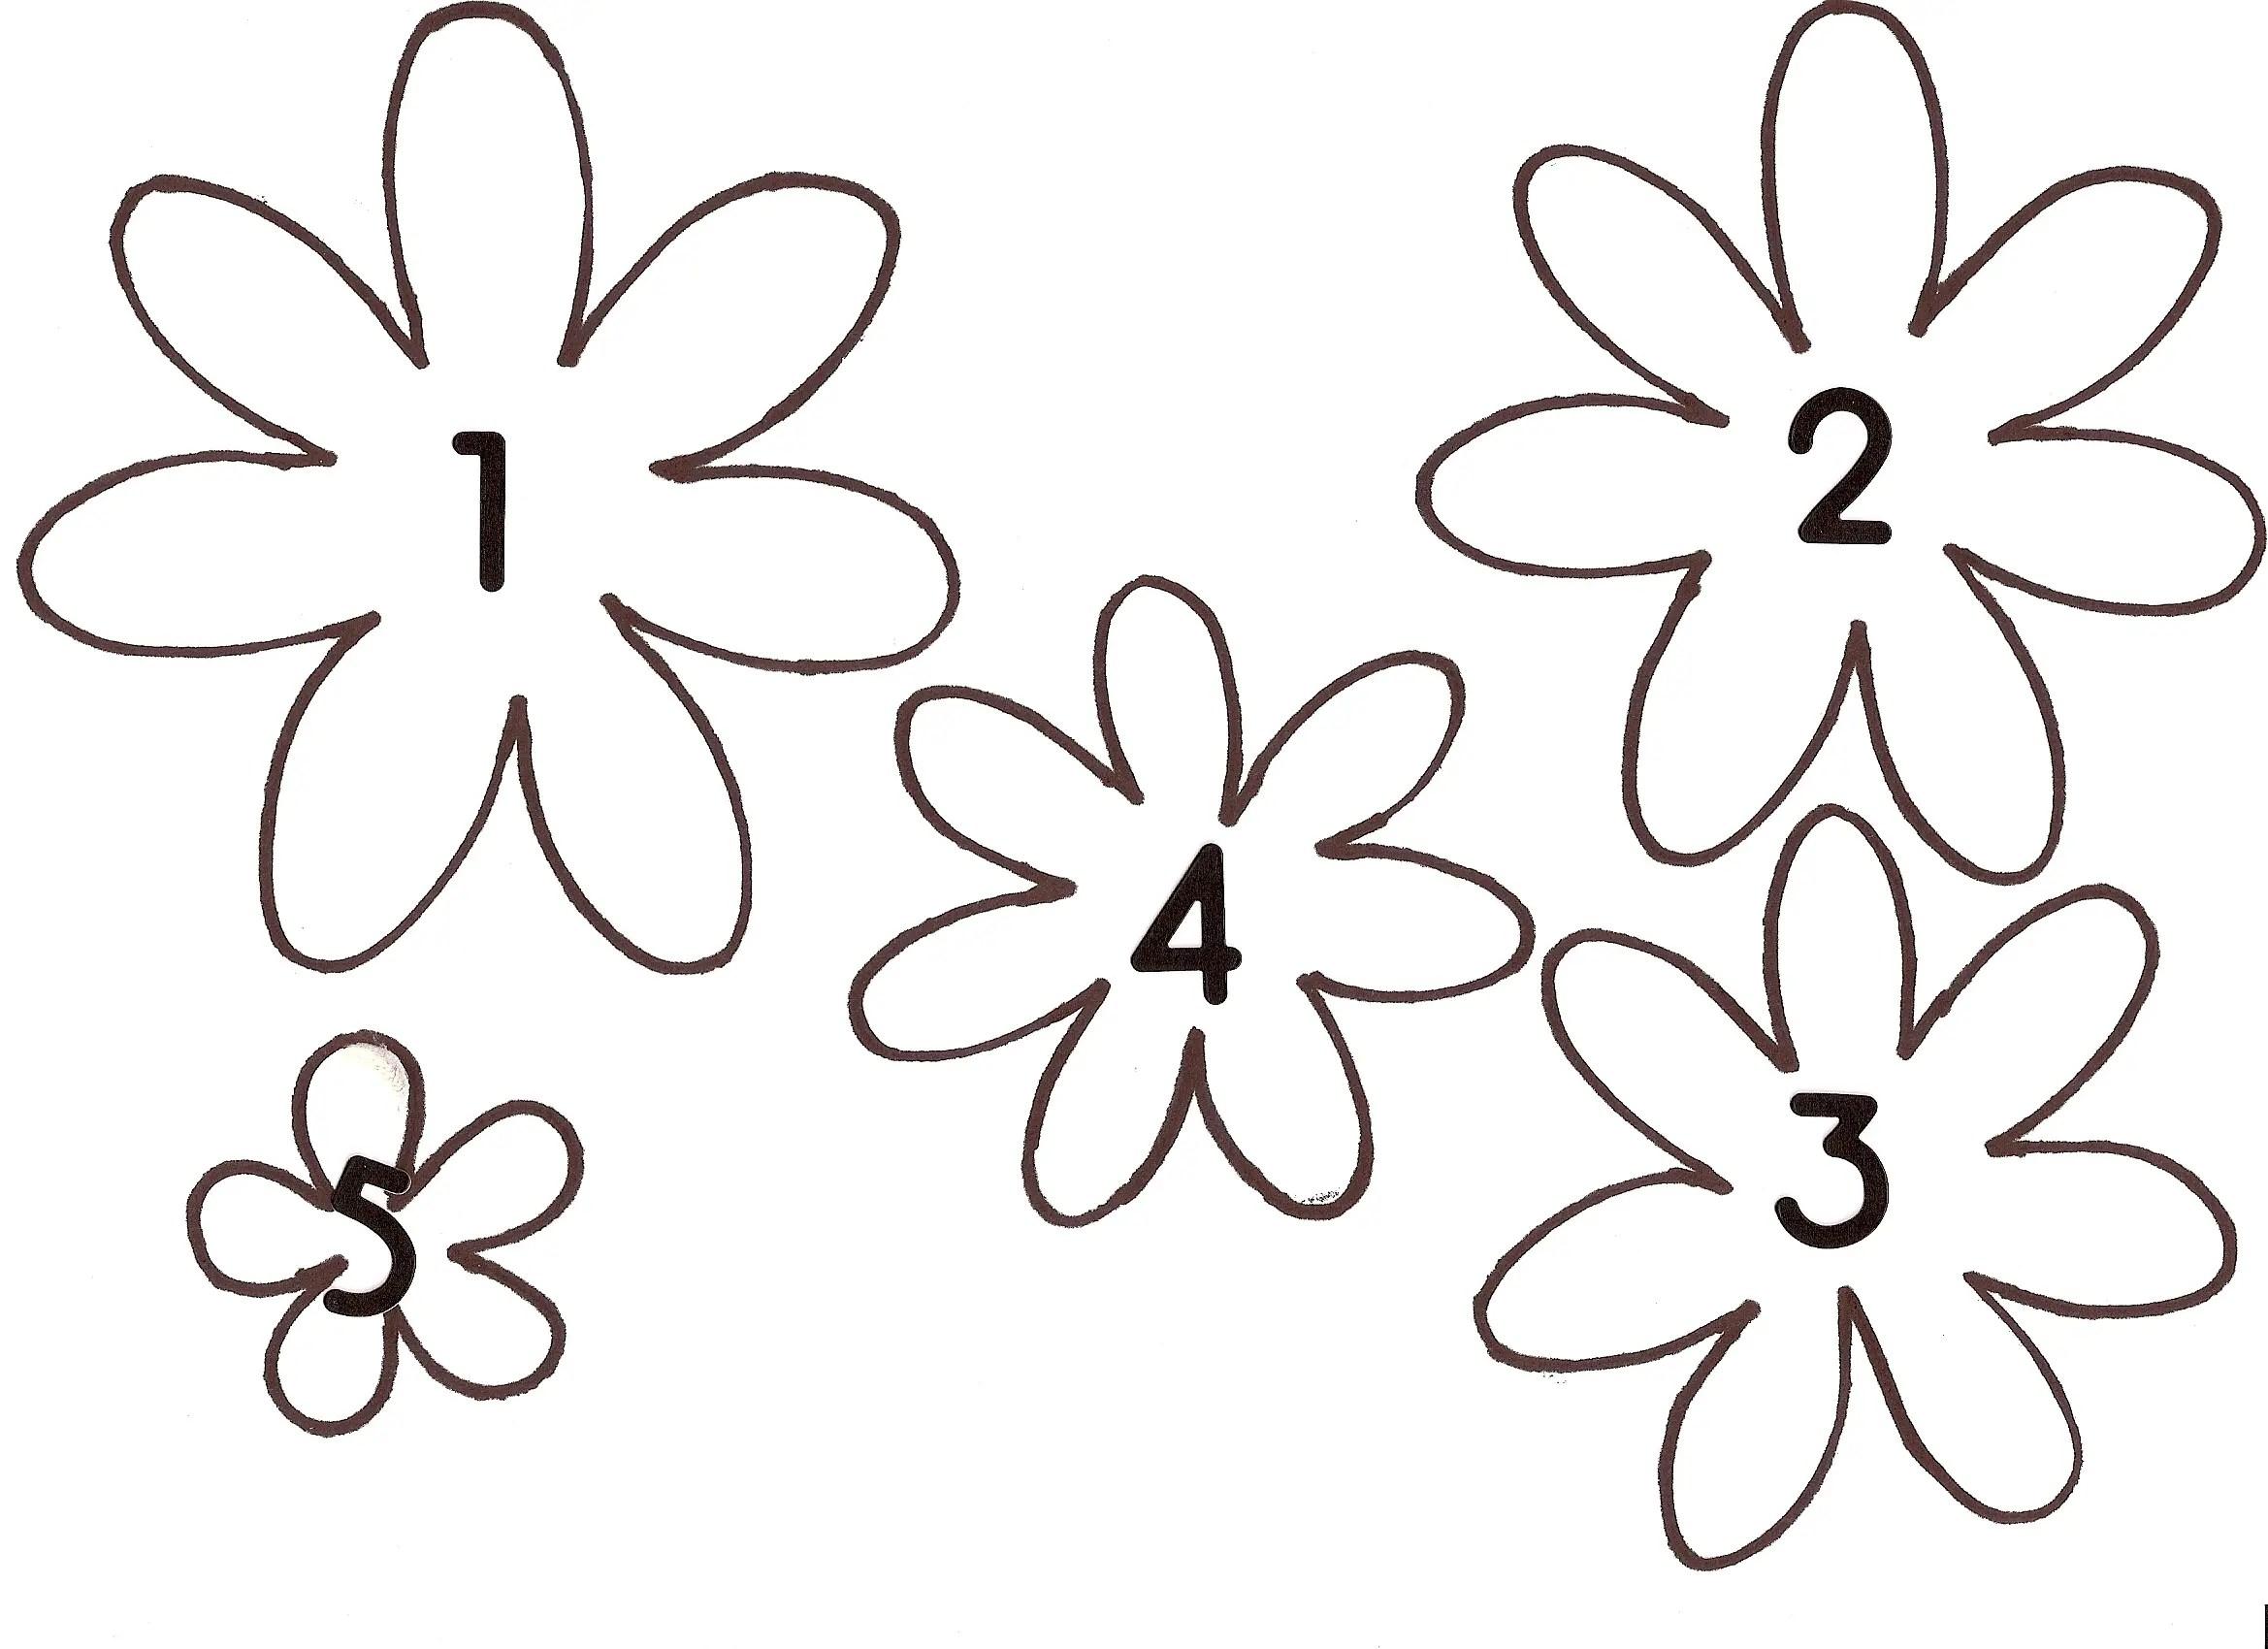 Flower Template. flower petal template 20 free word pdf documents ...